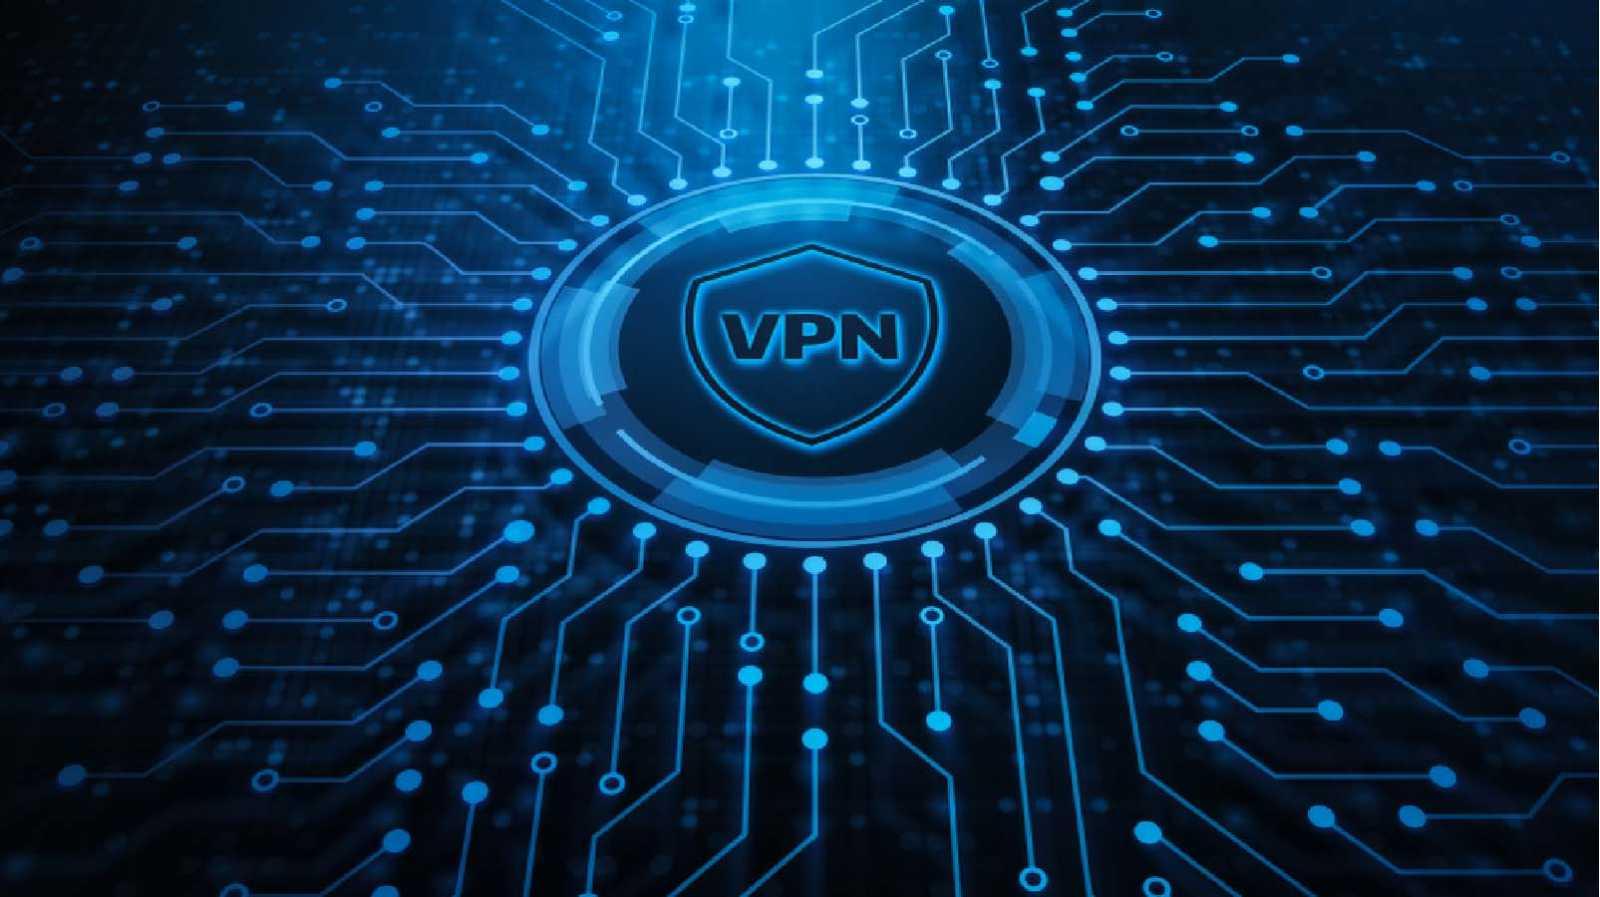 VPN bandwidth monitoring